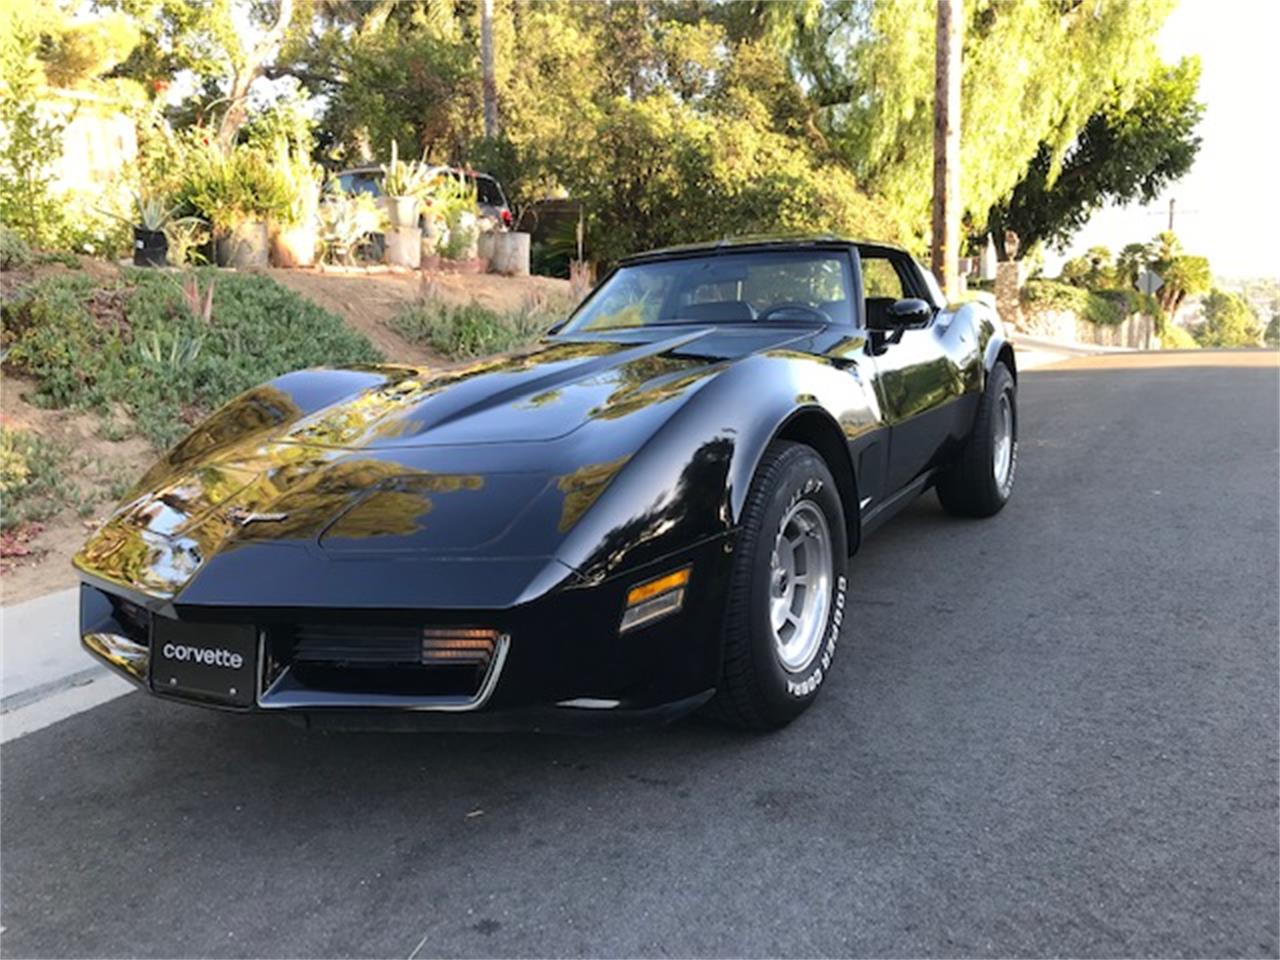 1980 Chevrolet Corvette (CC-1273968) for sale in Palm Springs, California